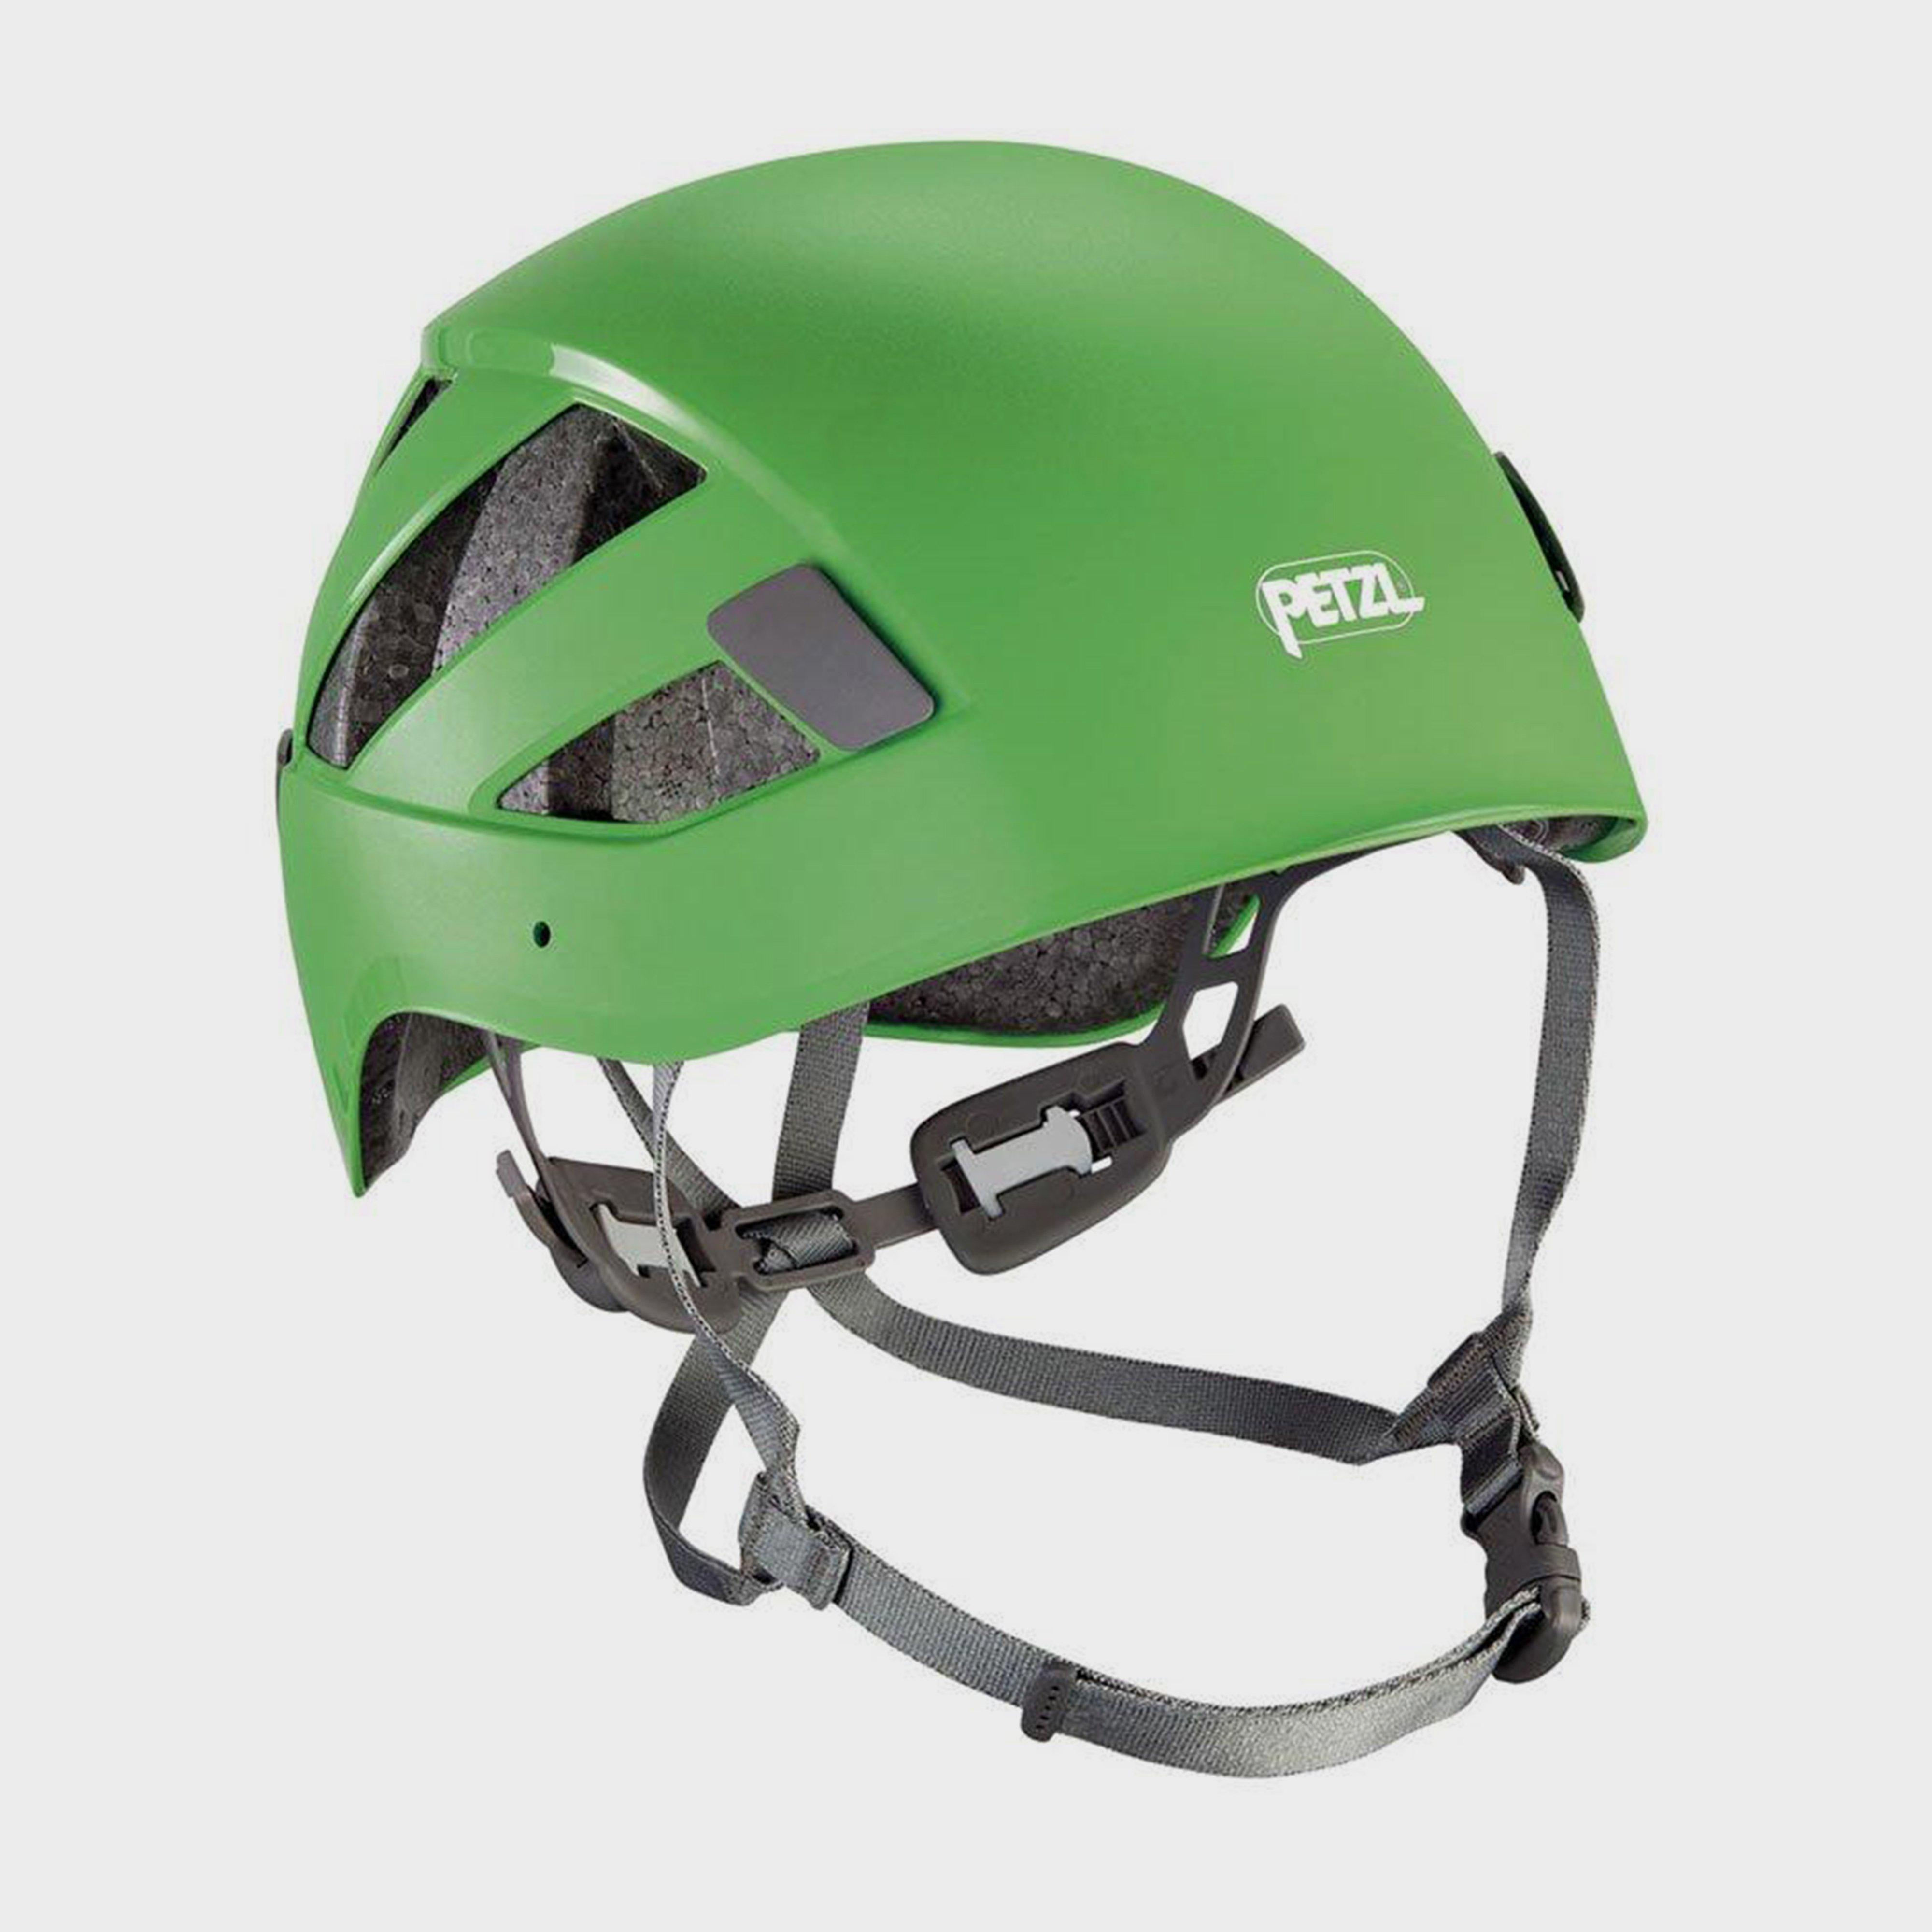 Petzl Petzl Boreo Climbing Helmet - Green, Green